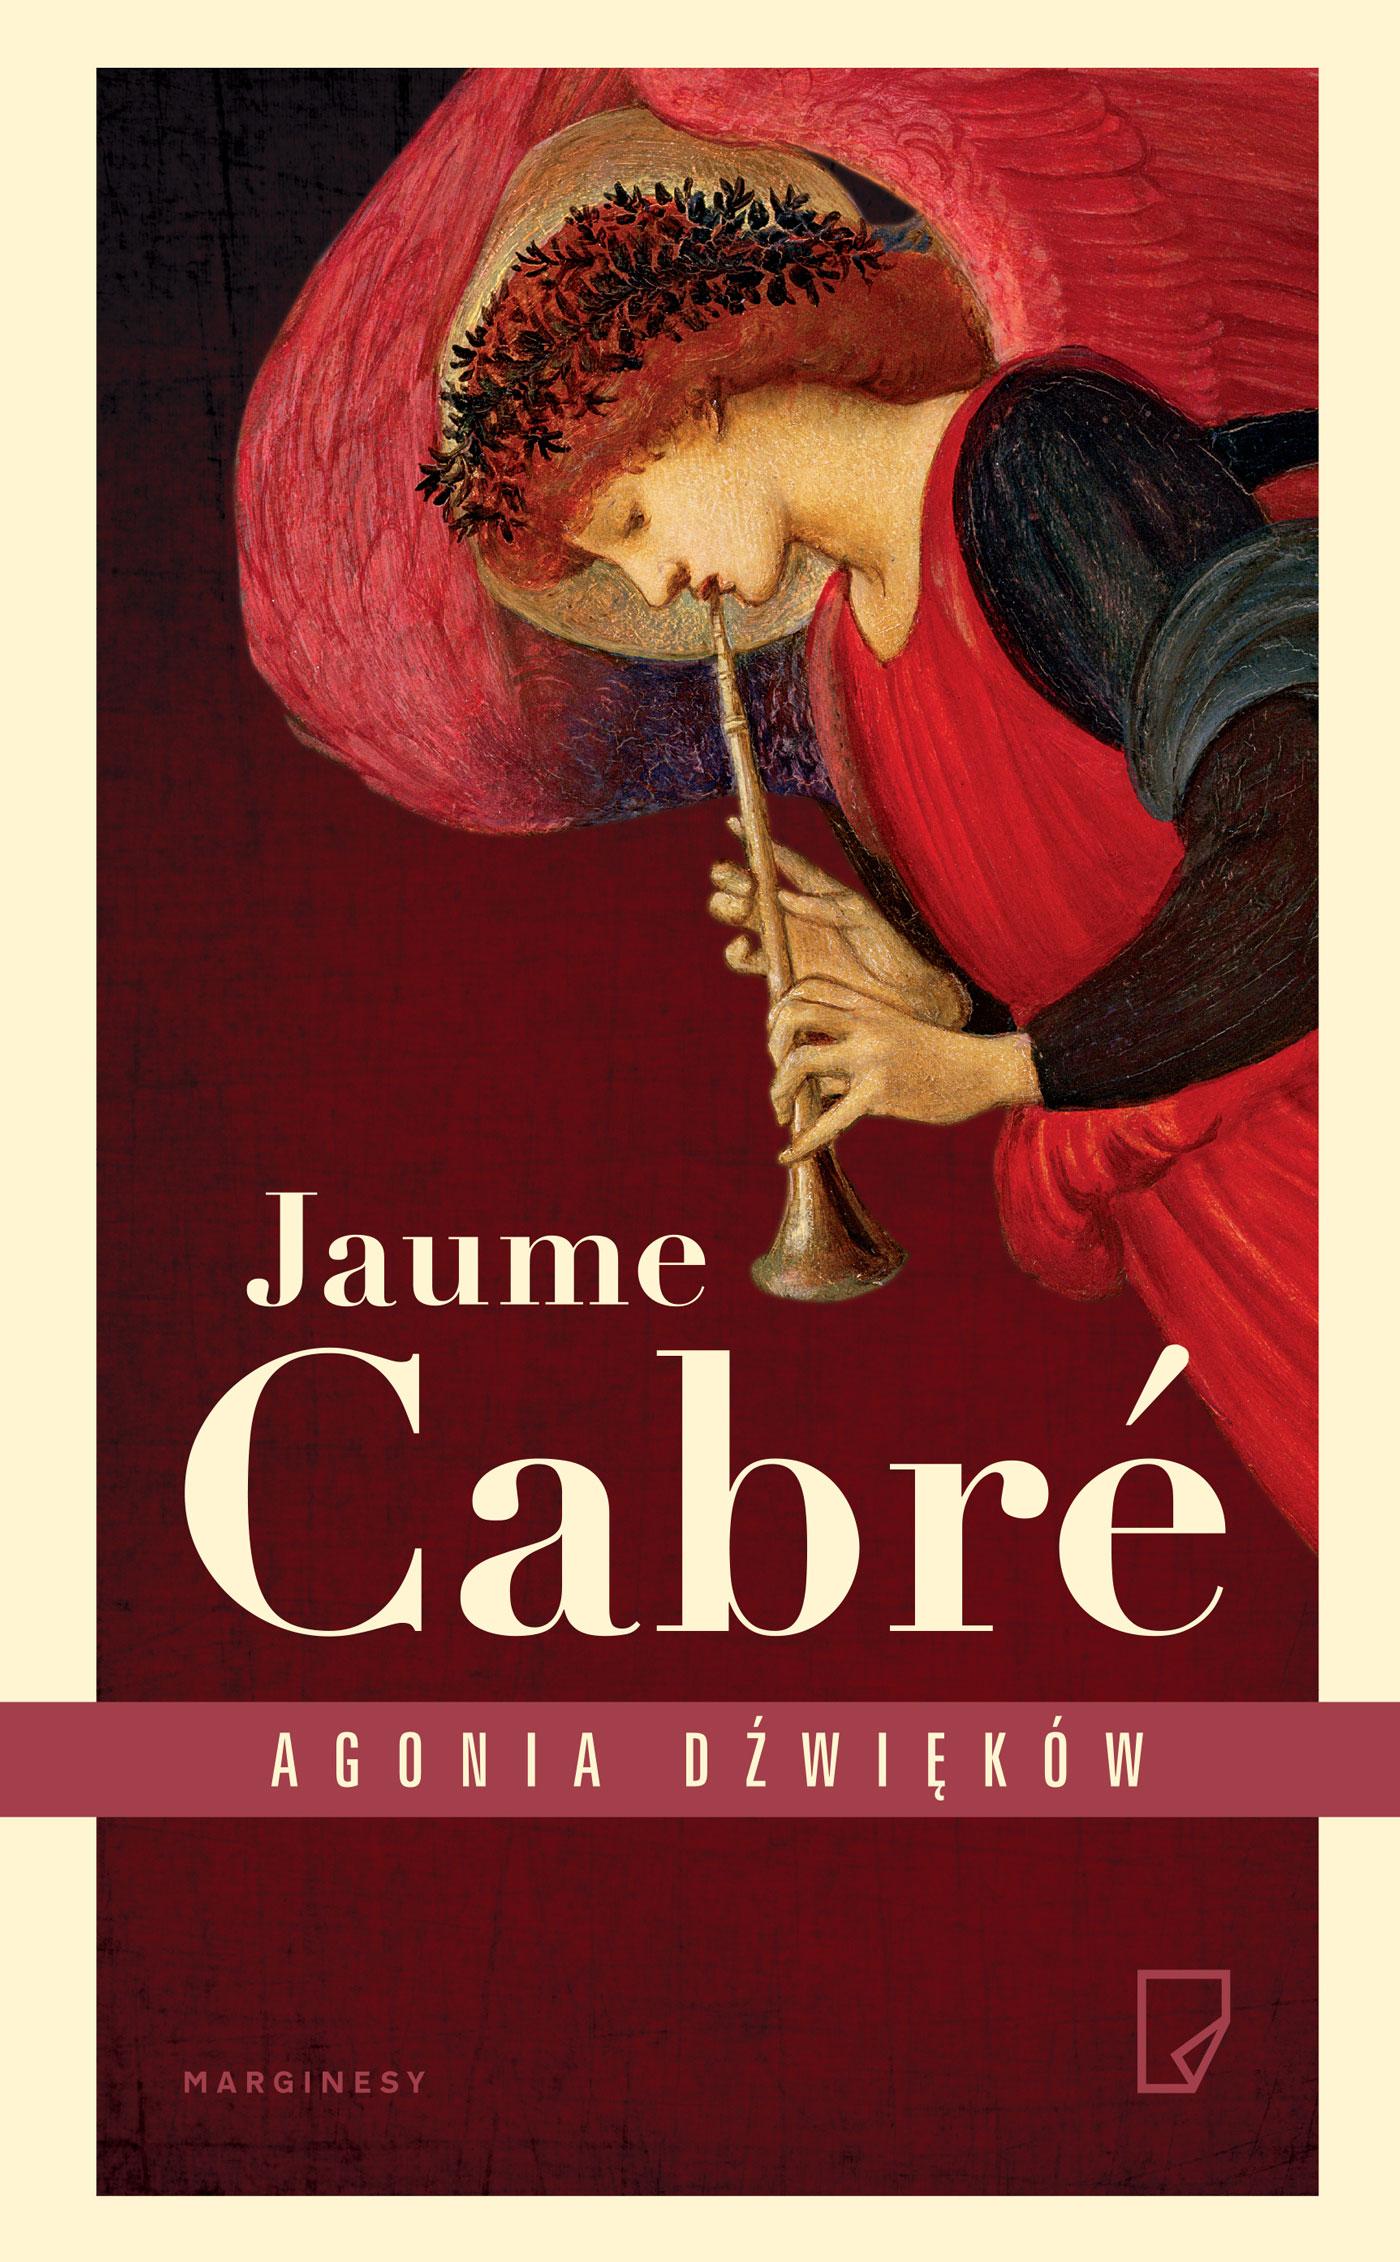 Agonia Dźwięków, Jaume Cabre